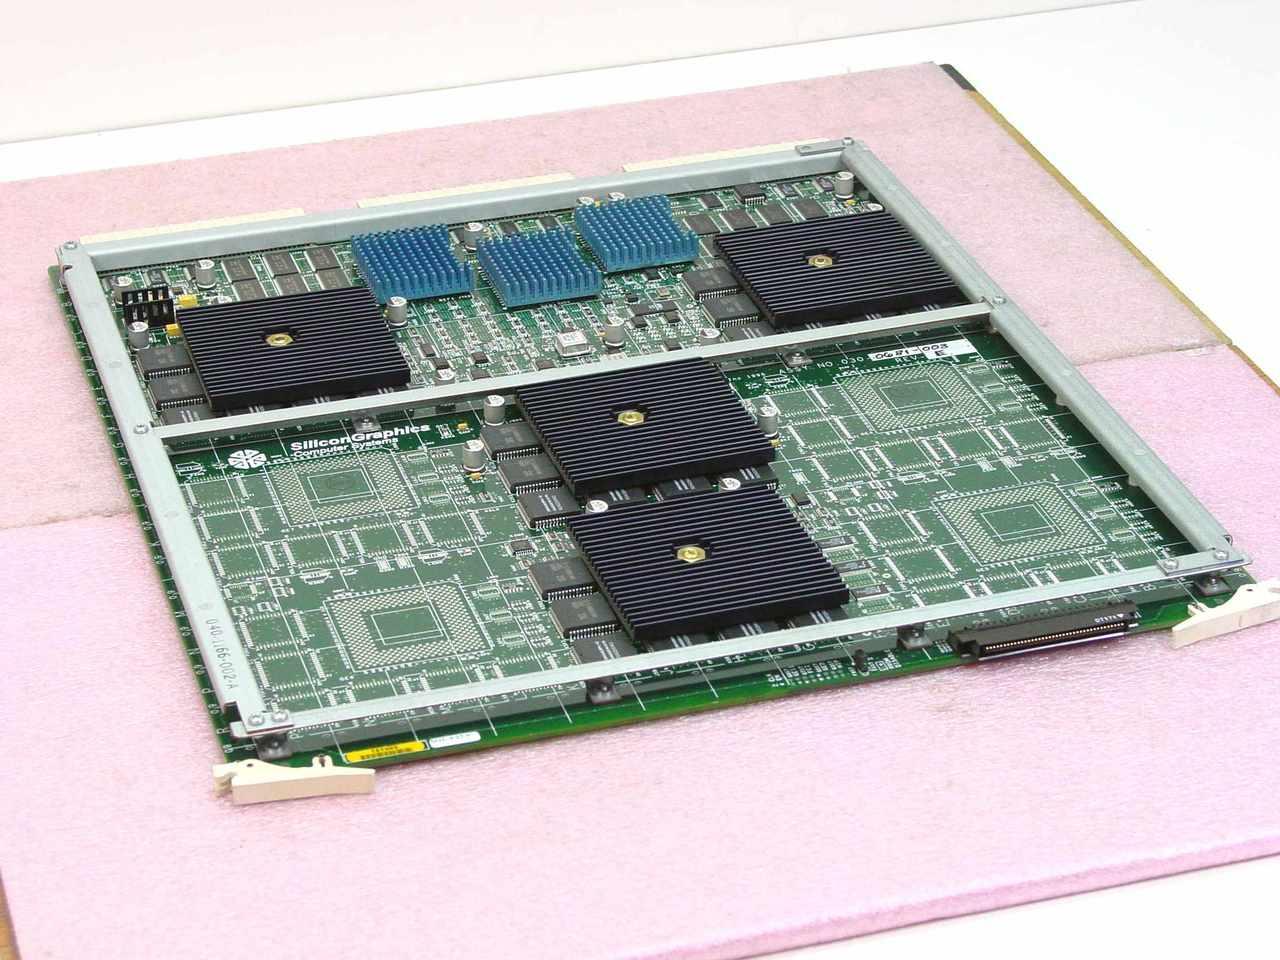 Details about  / SILICON GRAPHIC SGI Panel Board 030-0859-008